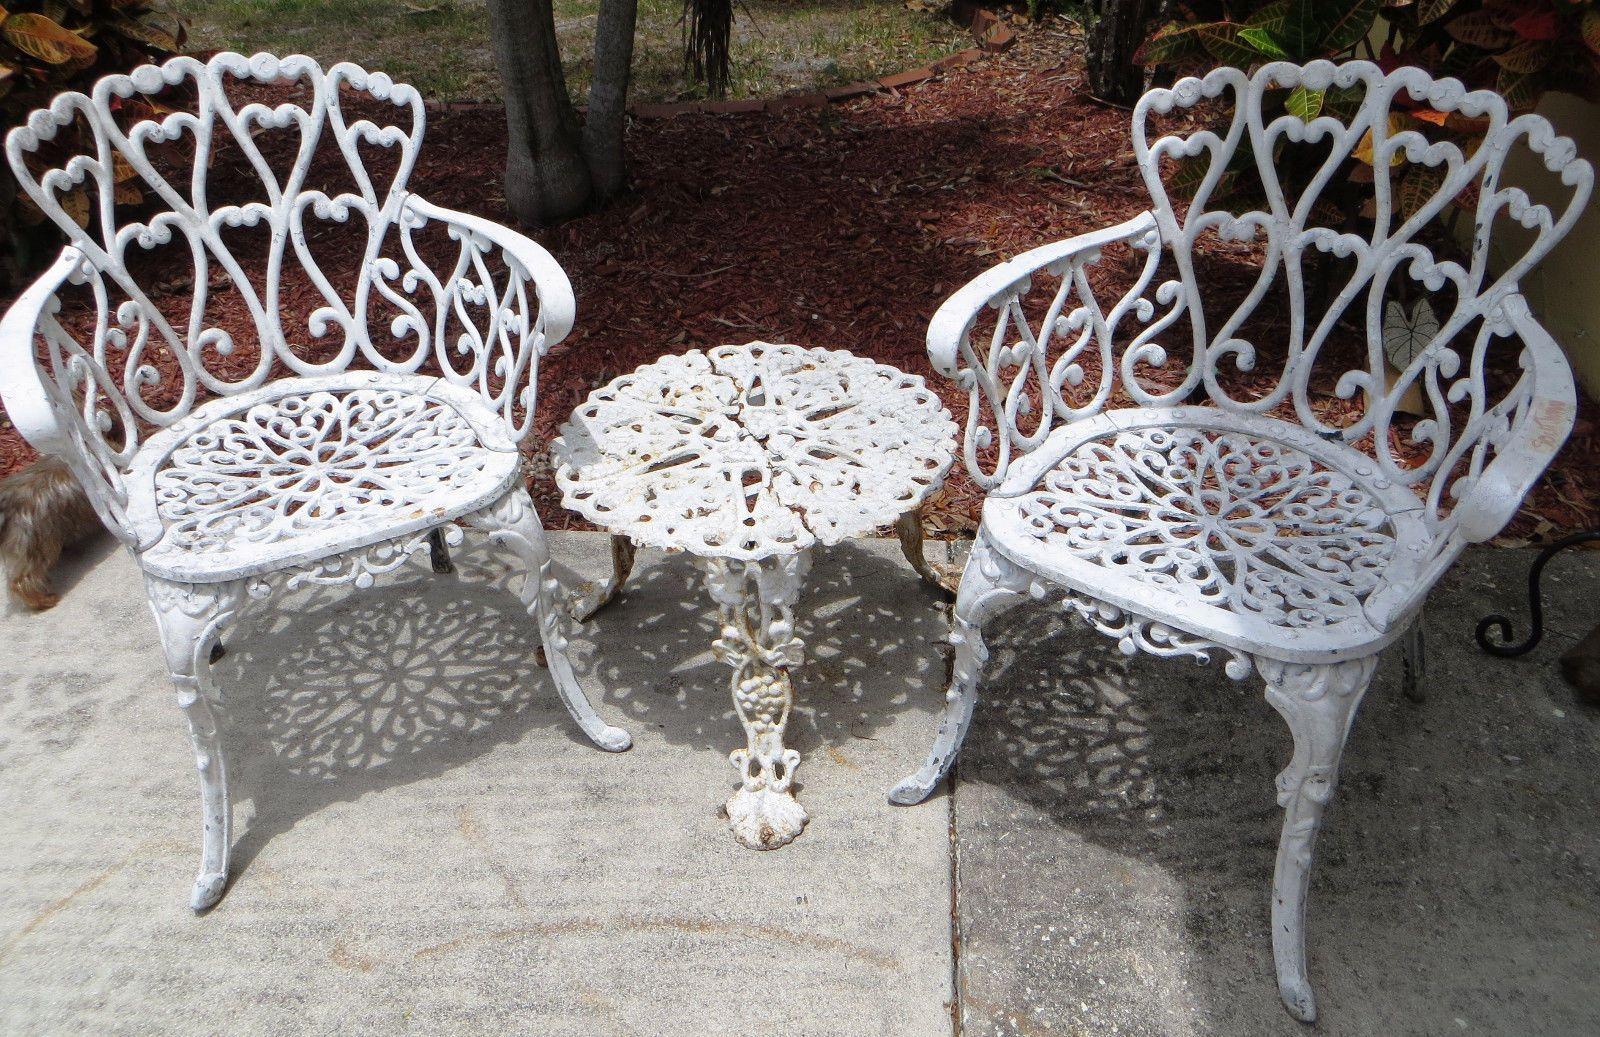 Woodard Chantilly Rose 5 Piece Set Offered On Ebay Starting At